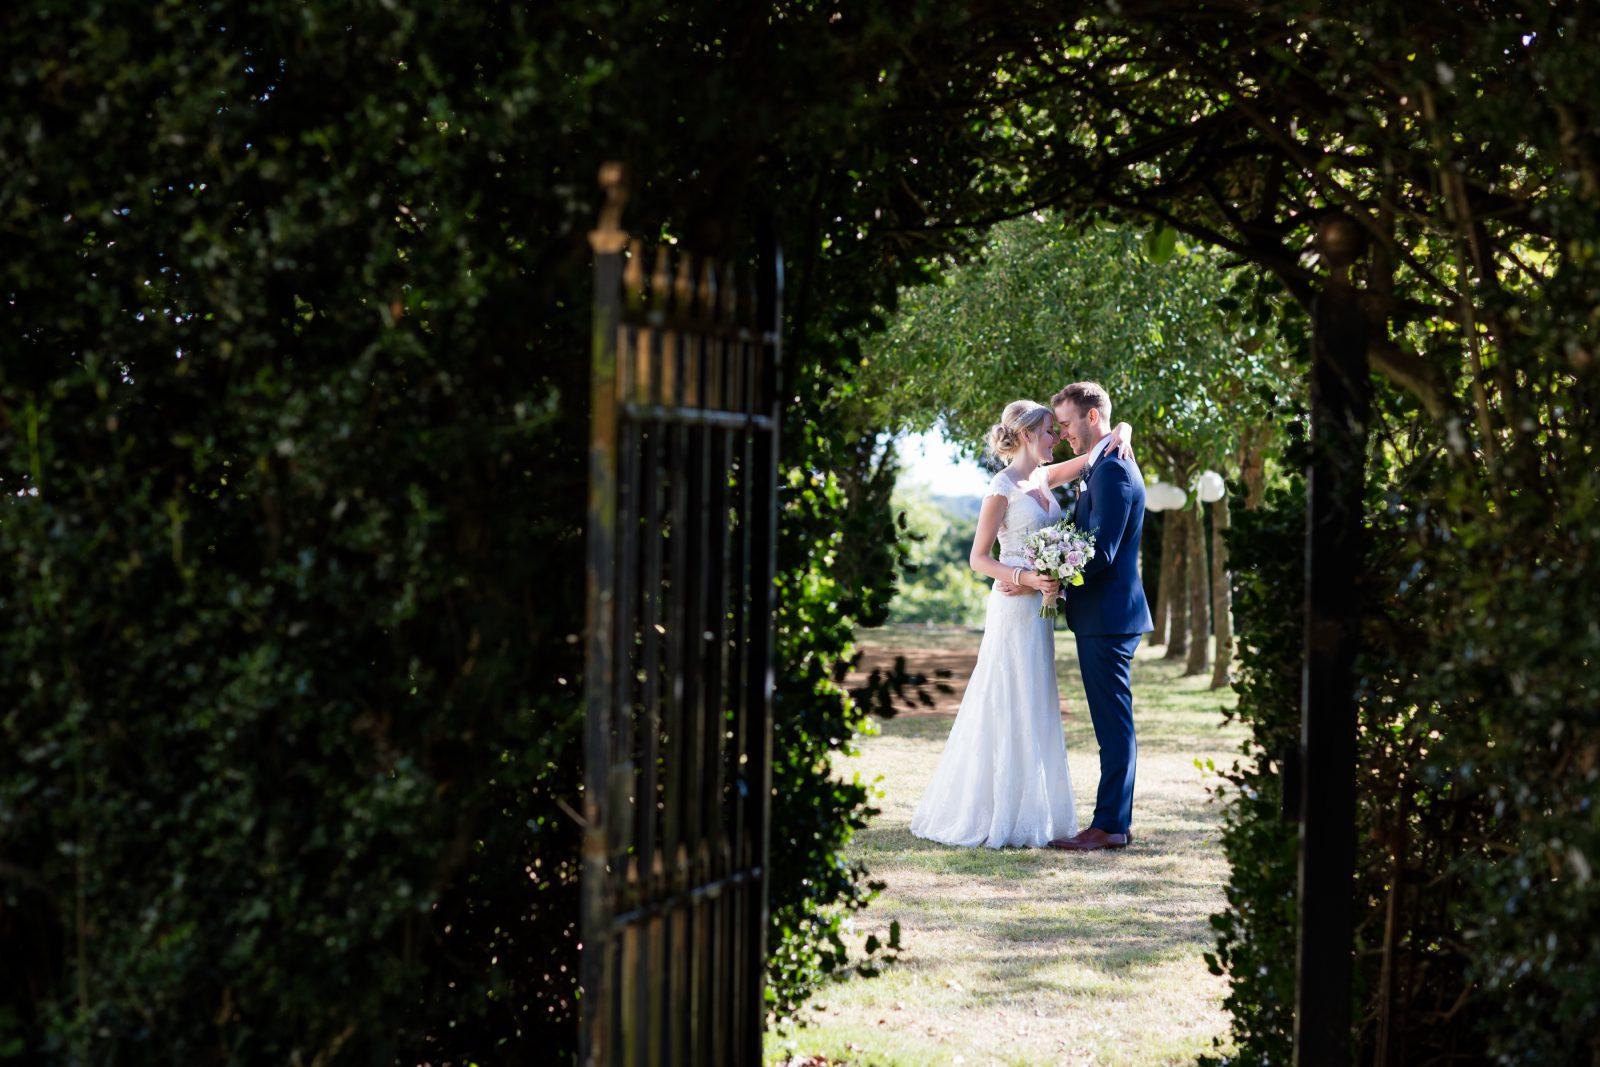 Intimate Runaway Weddings At Bridwell